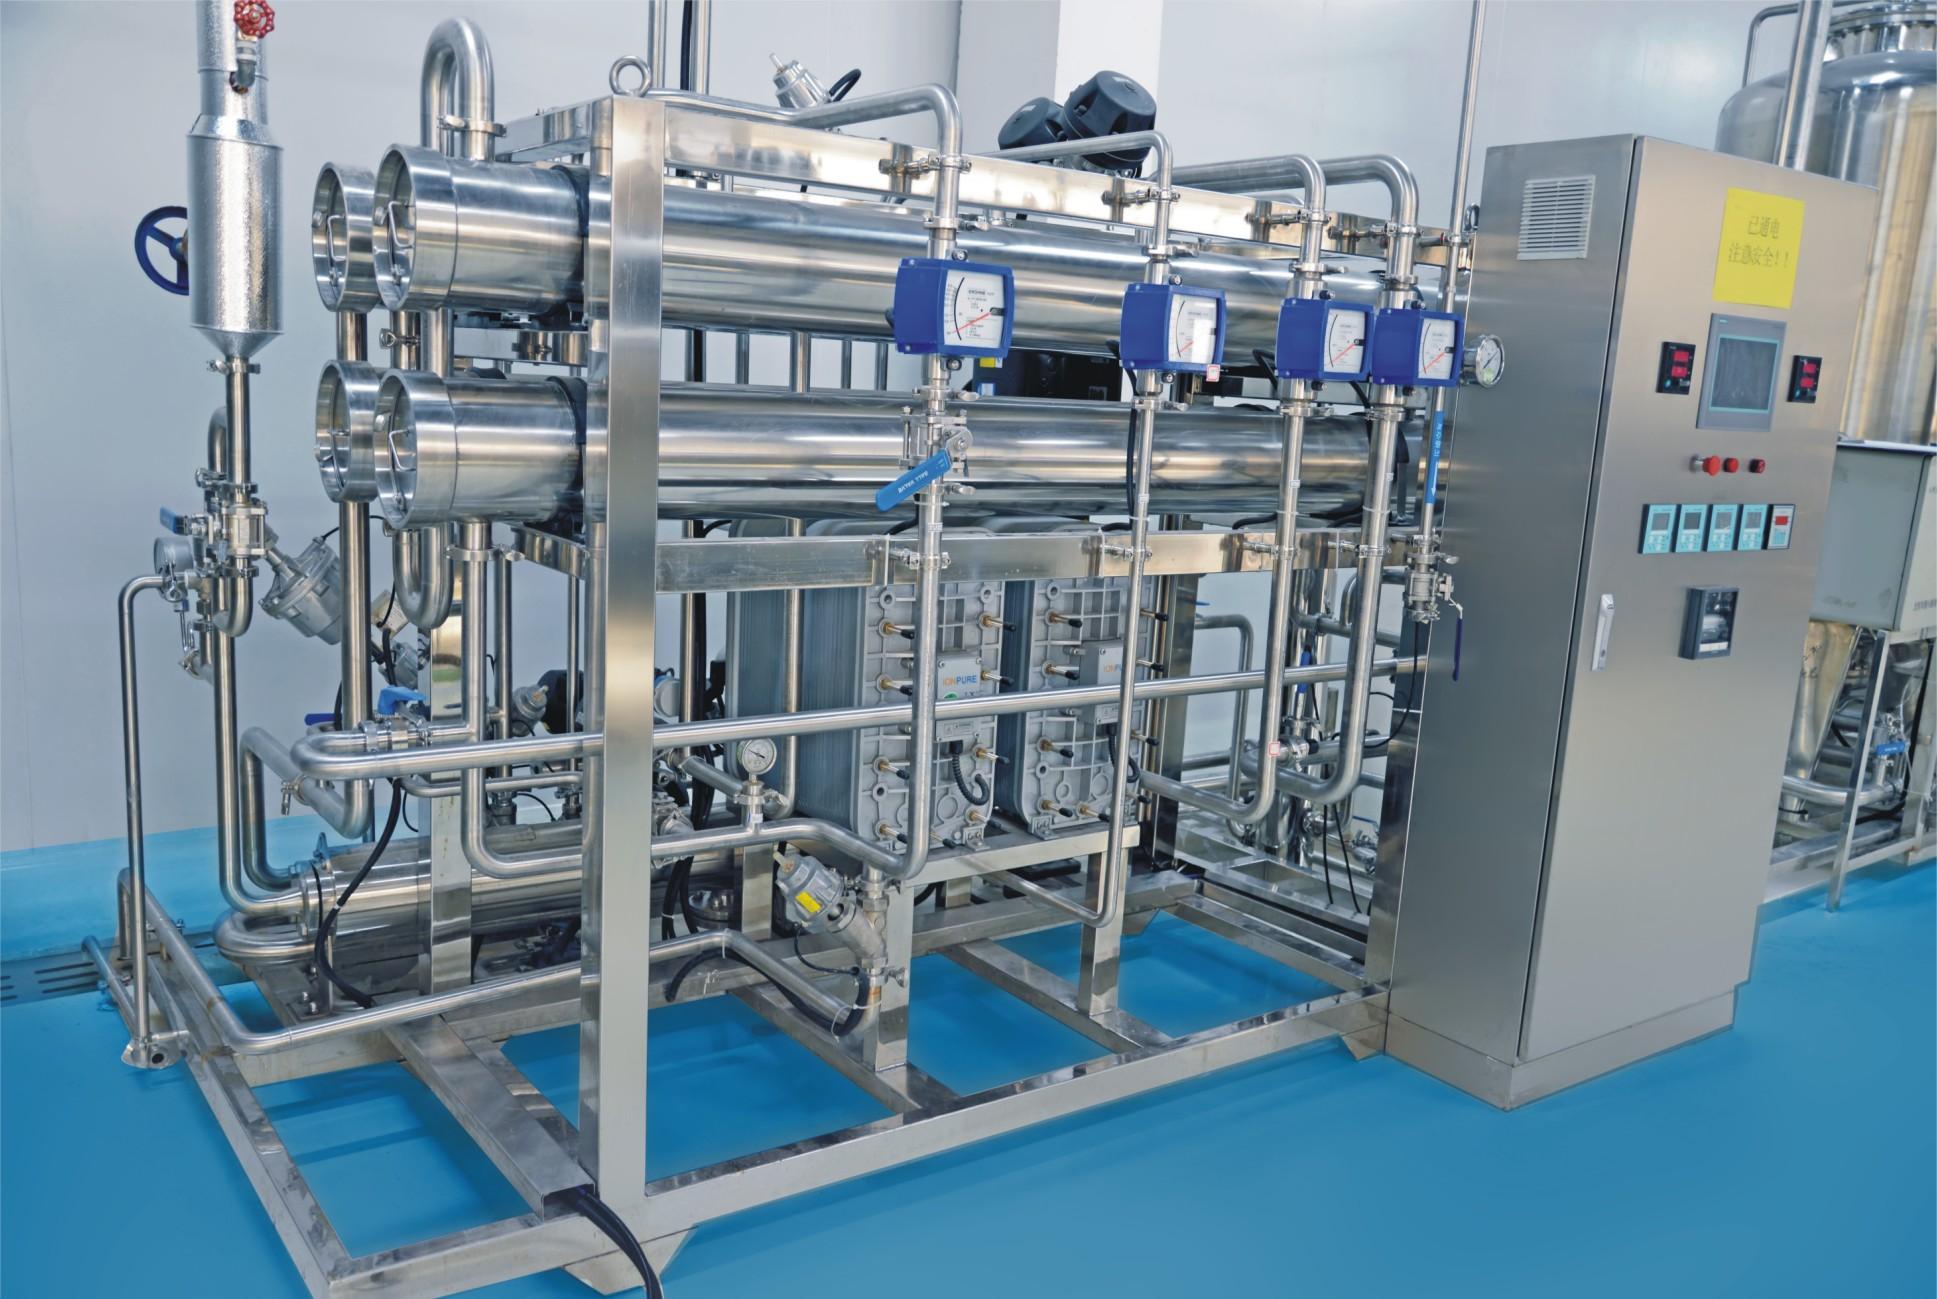 पेशेवर स्वचालित आरओ जल उपचार संयंत्र कीमत